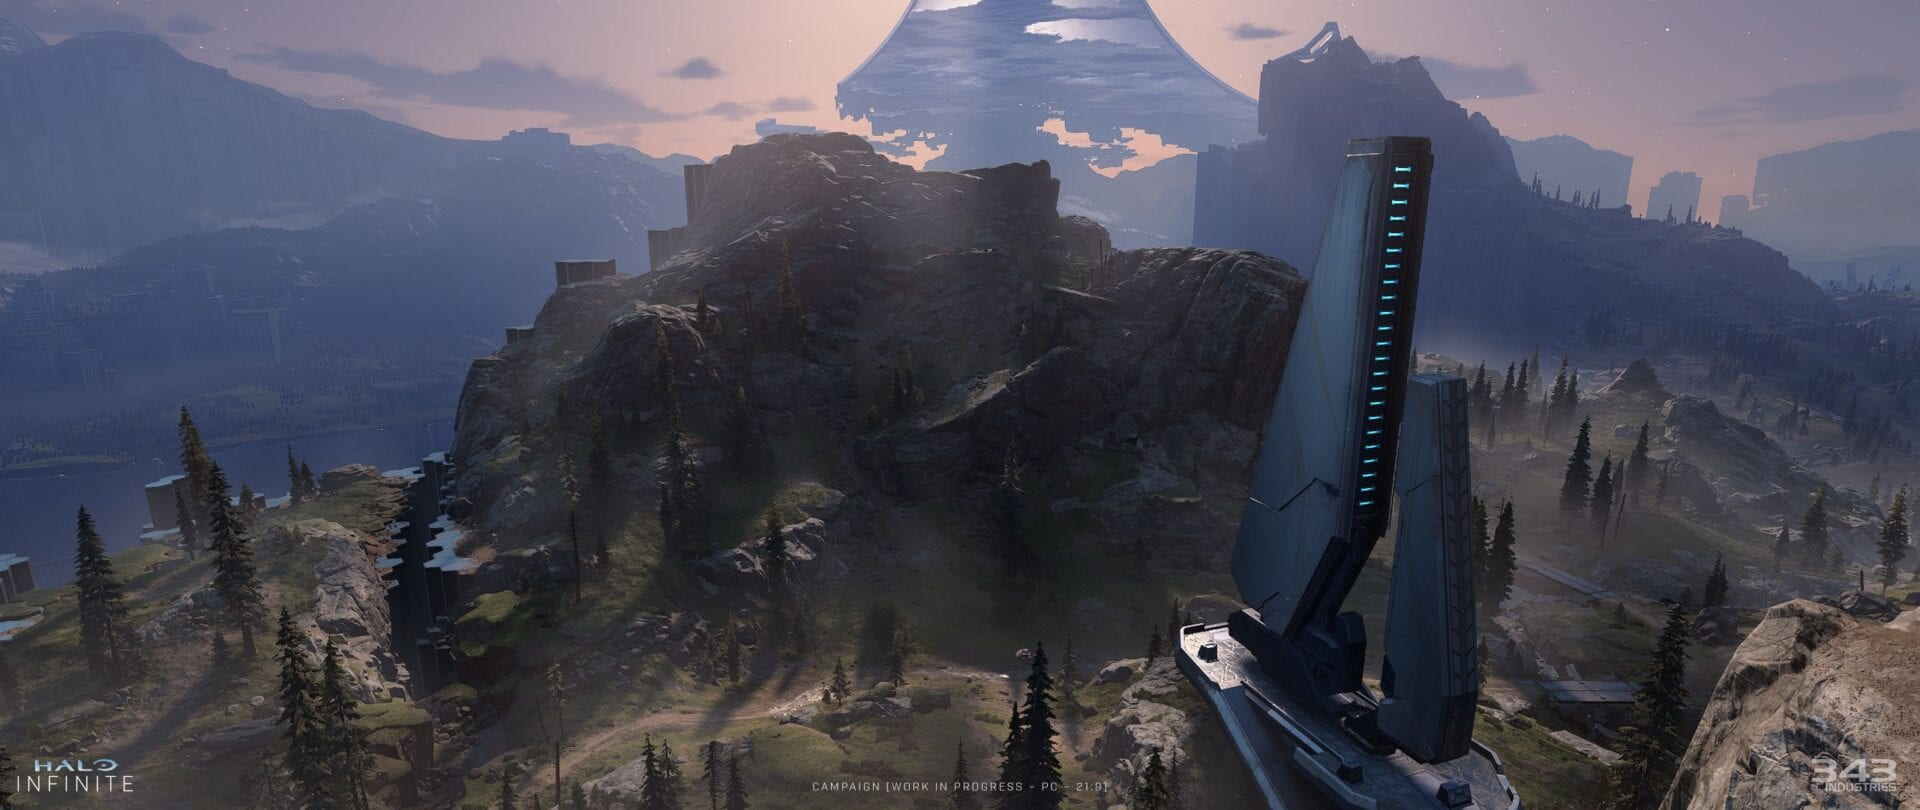 Halo-Infinite-10-scaled-1